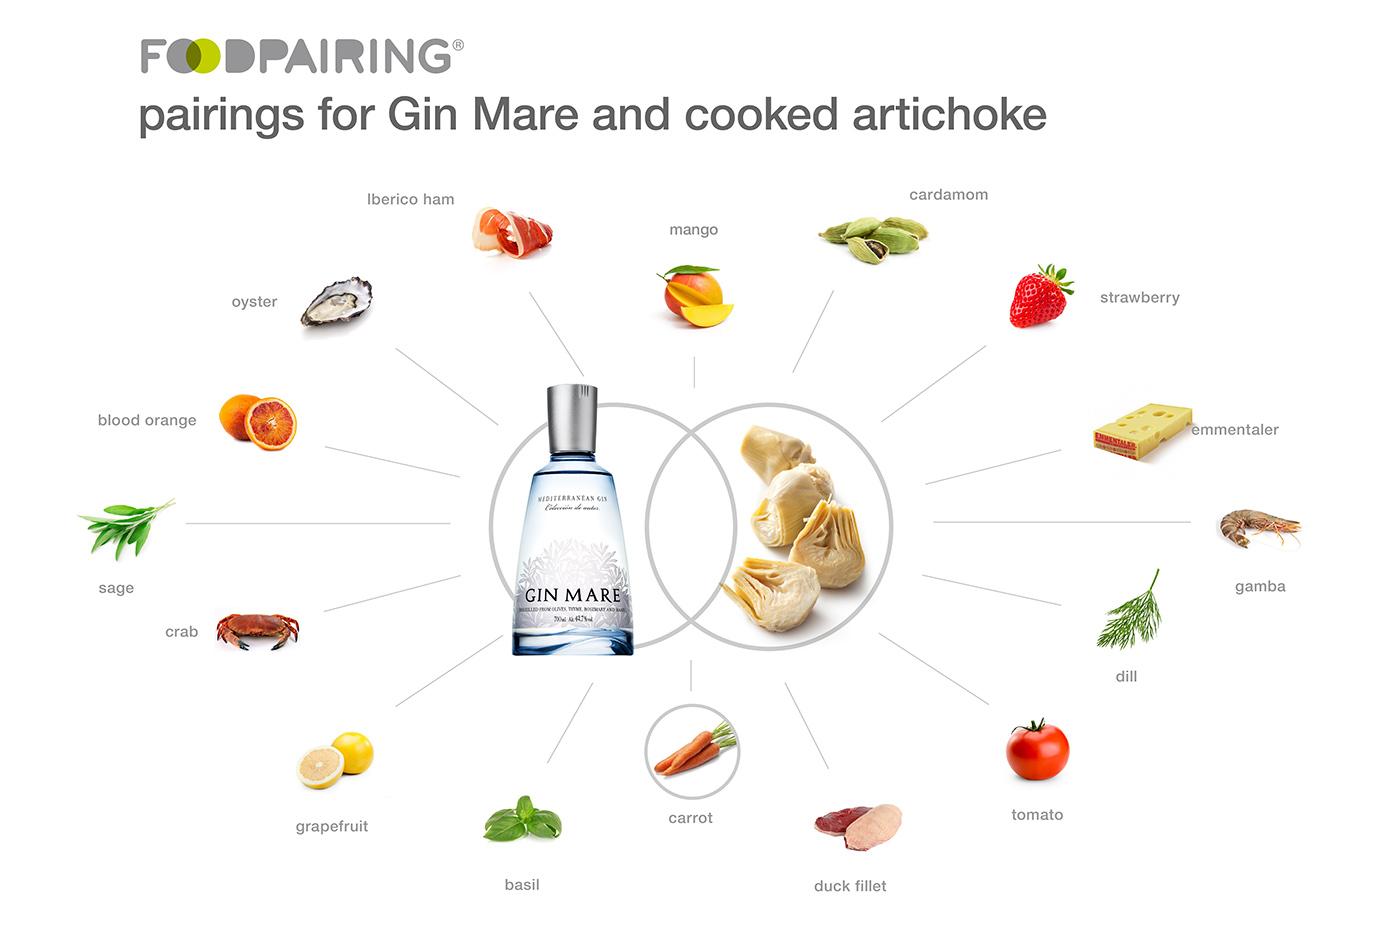 Foodpairing Artichoke